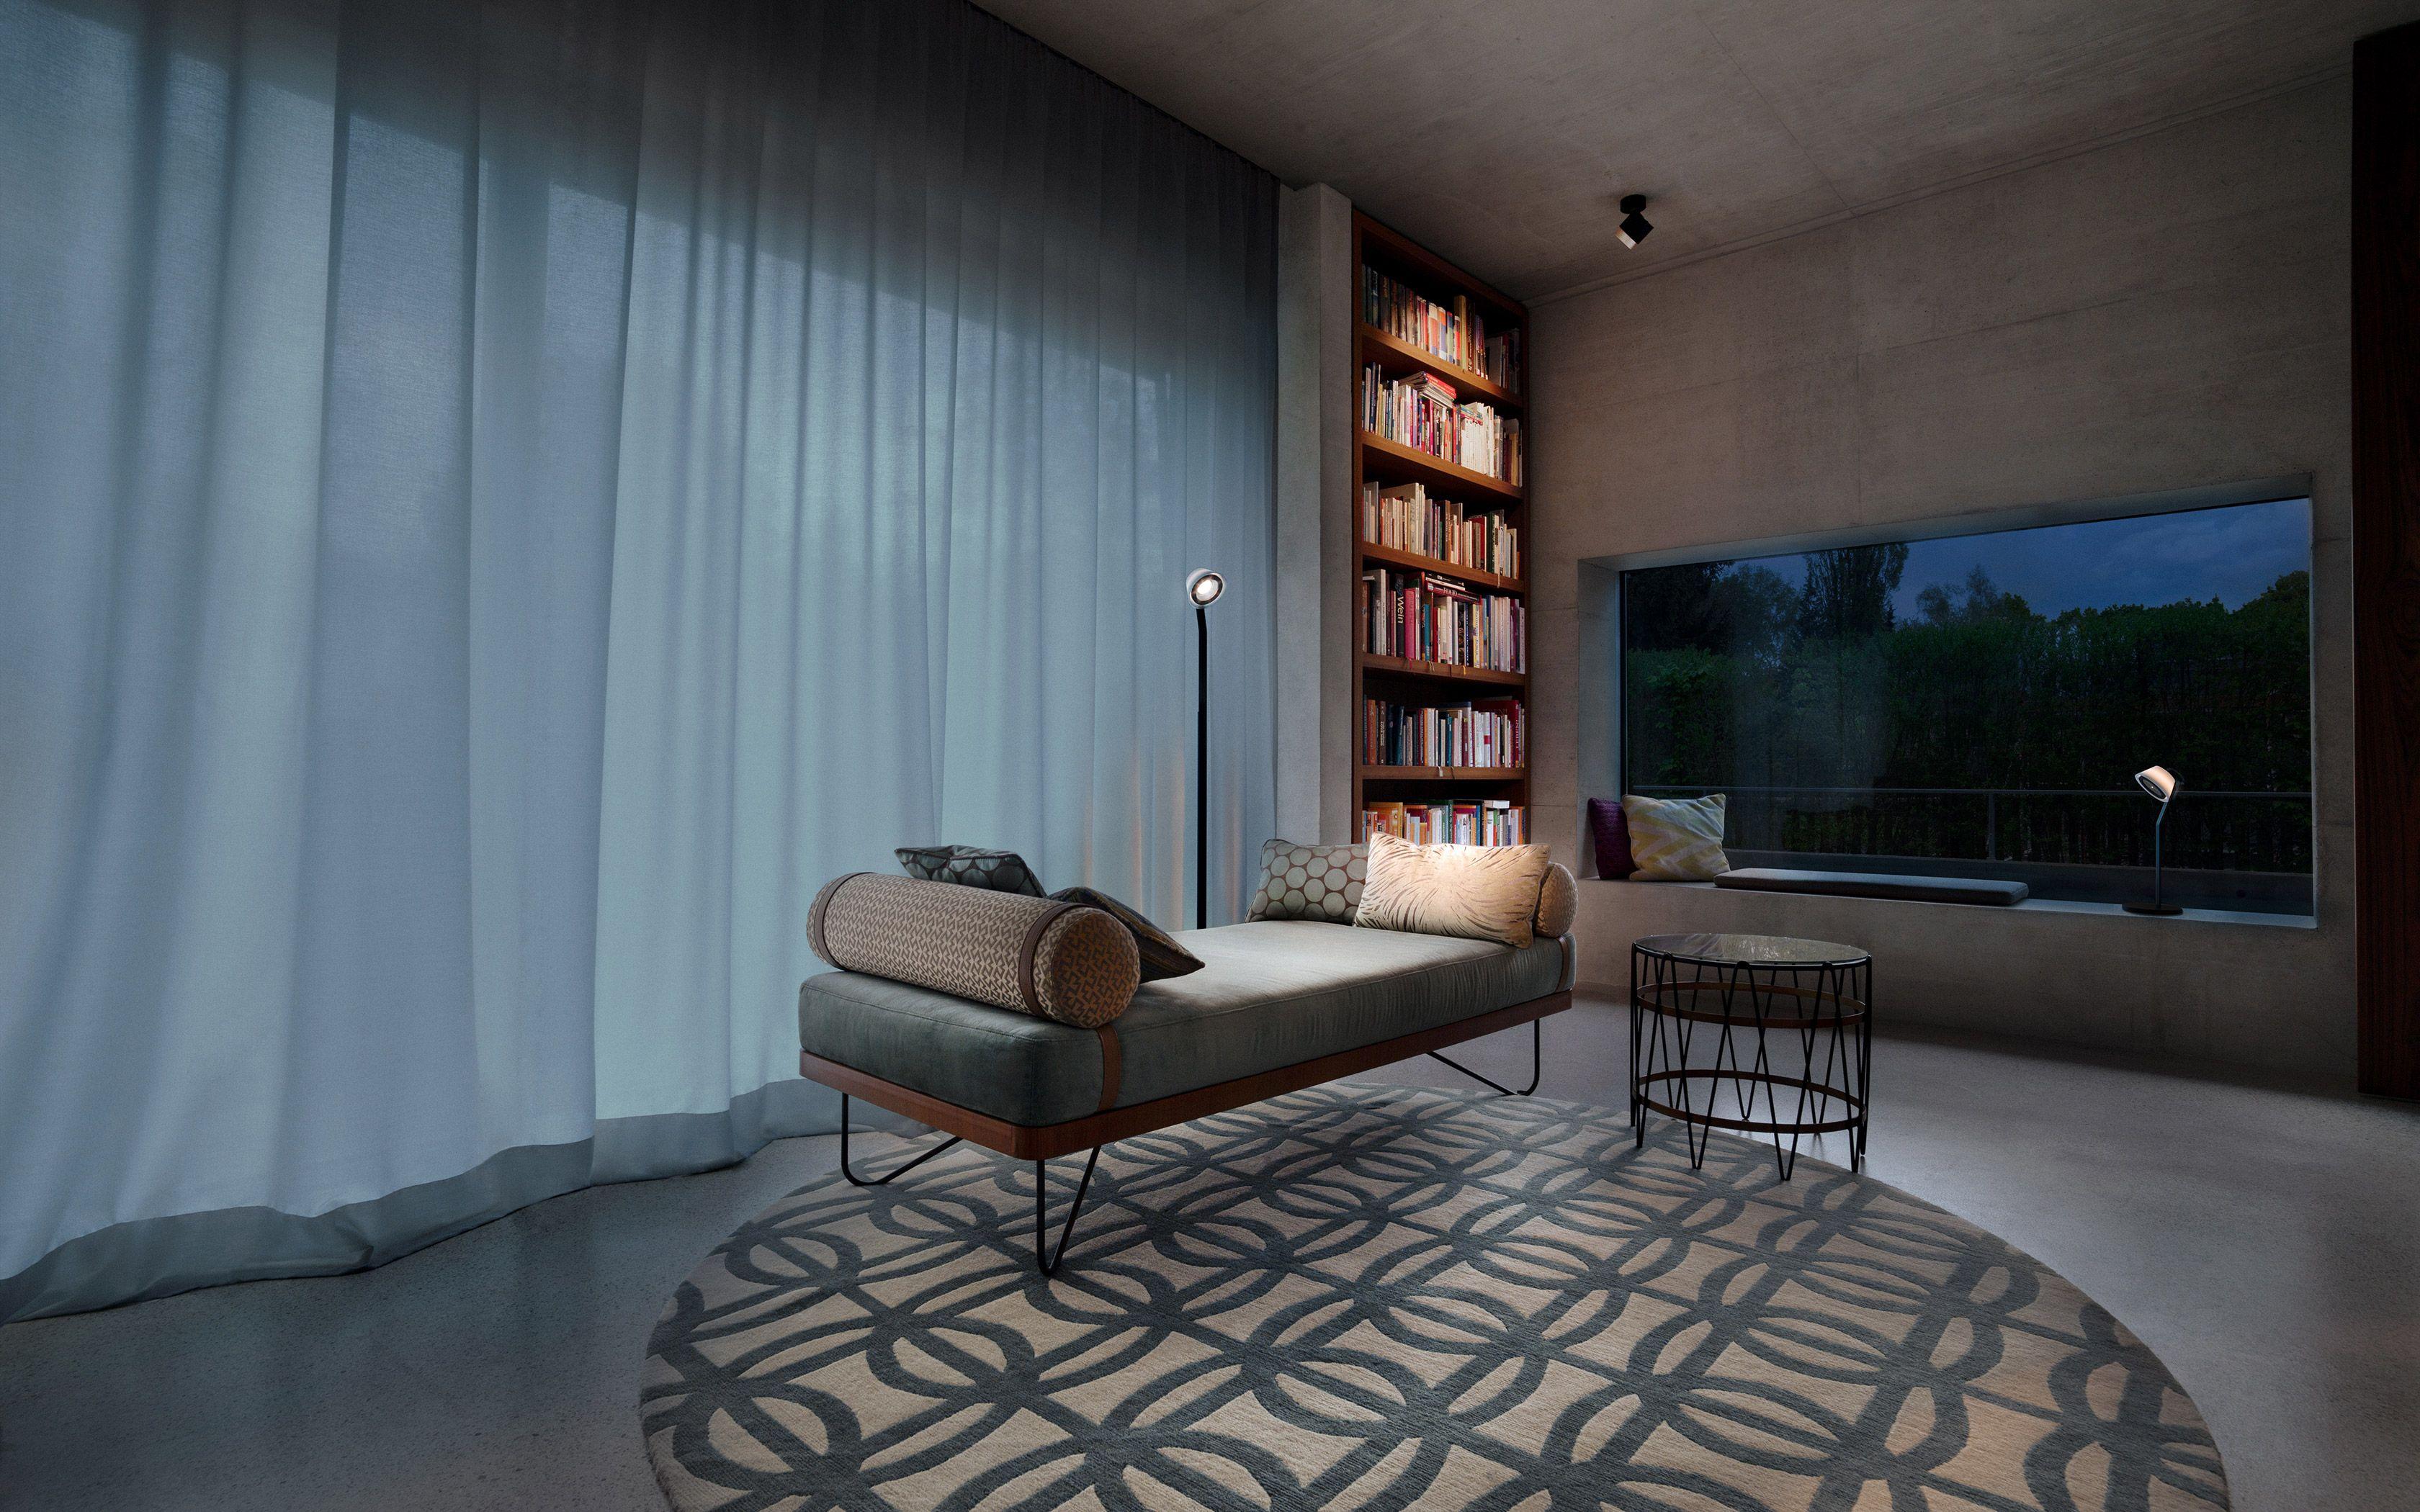 ceiling: lui pico   floor: lei lettura   window: lei tavolo